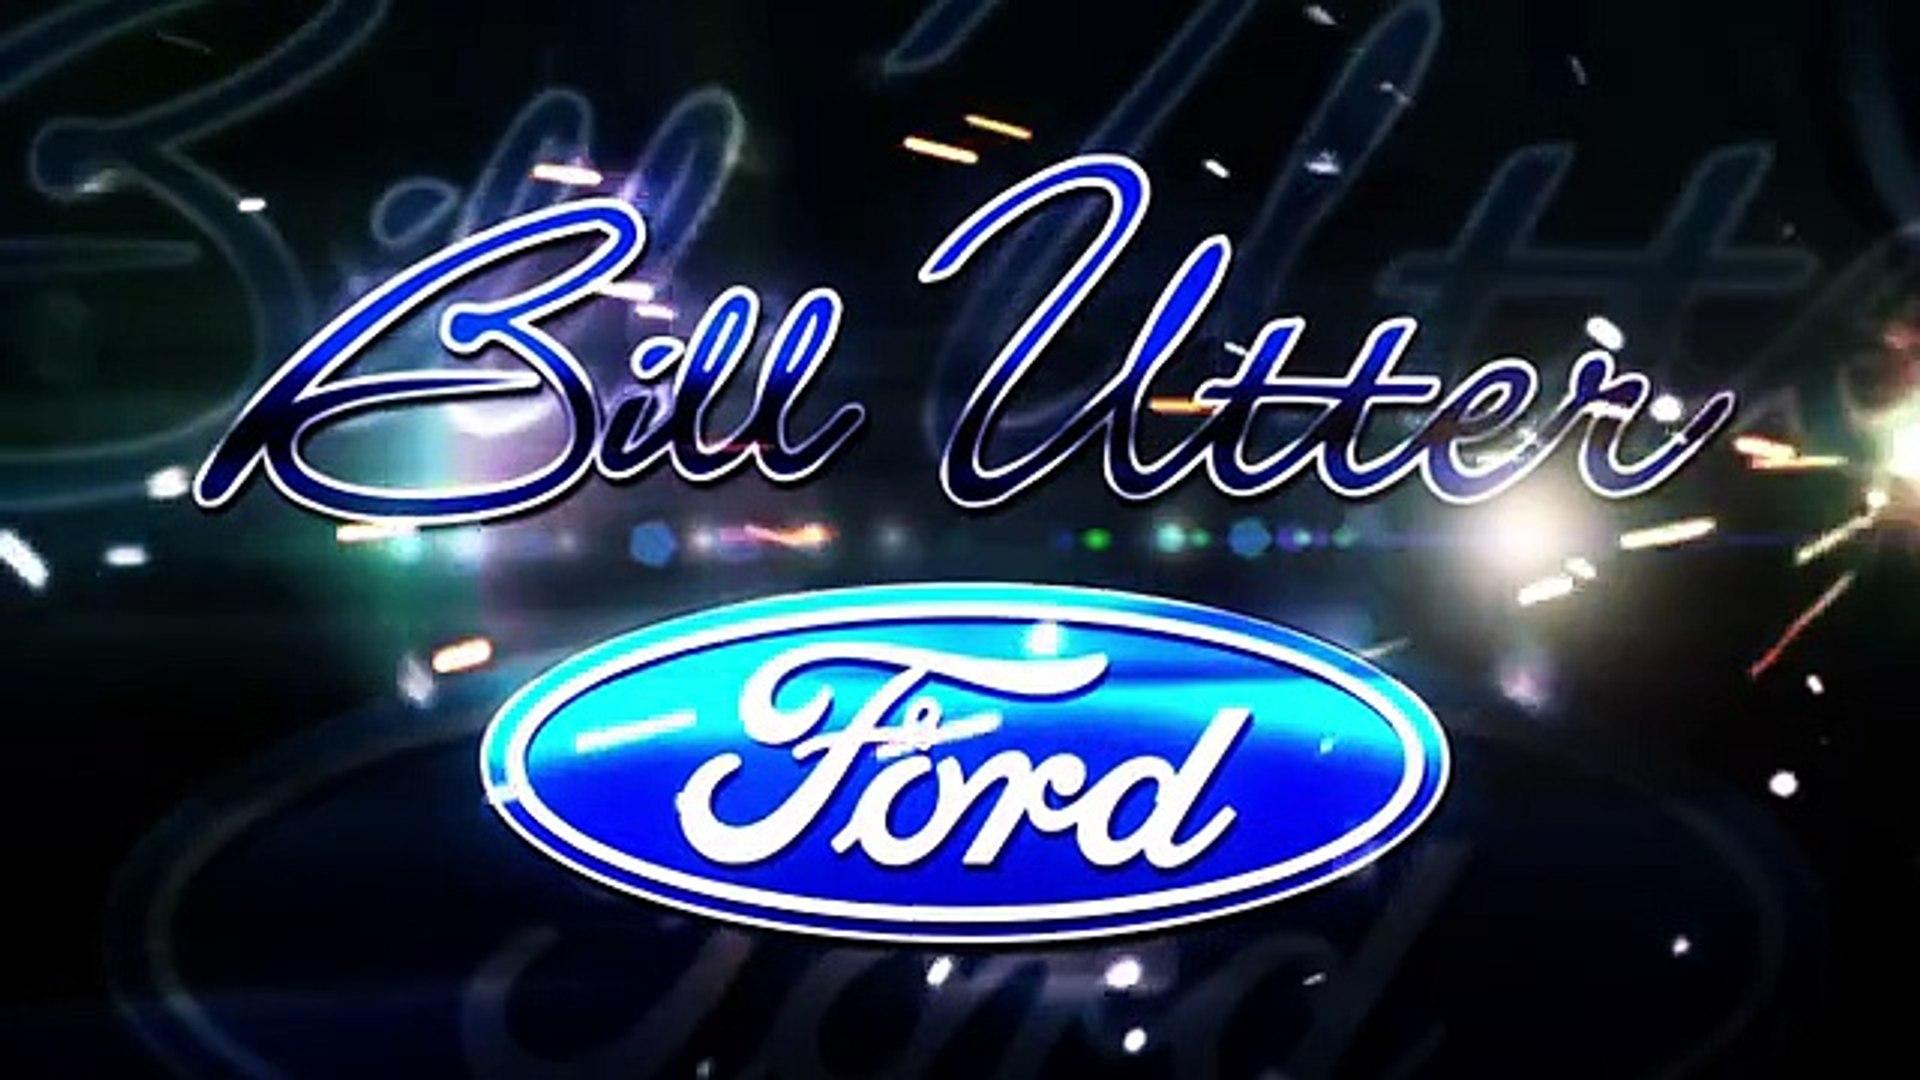 2017 Ford Flex Justin, TX | Ford Flex Justin, TX